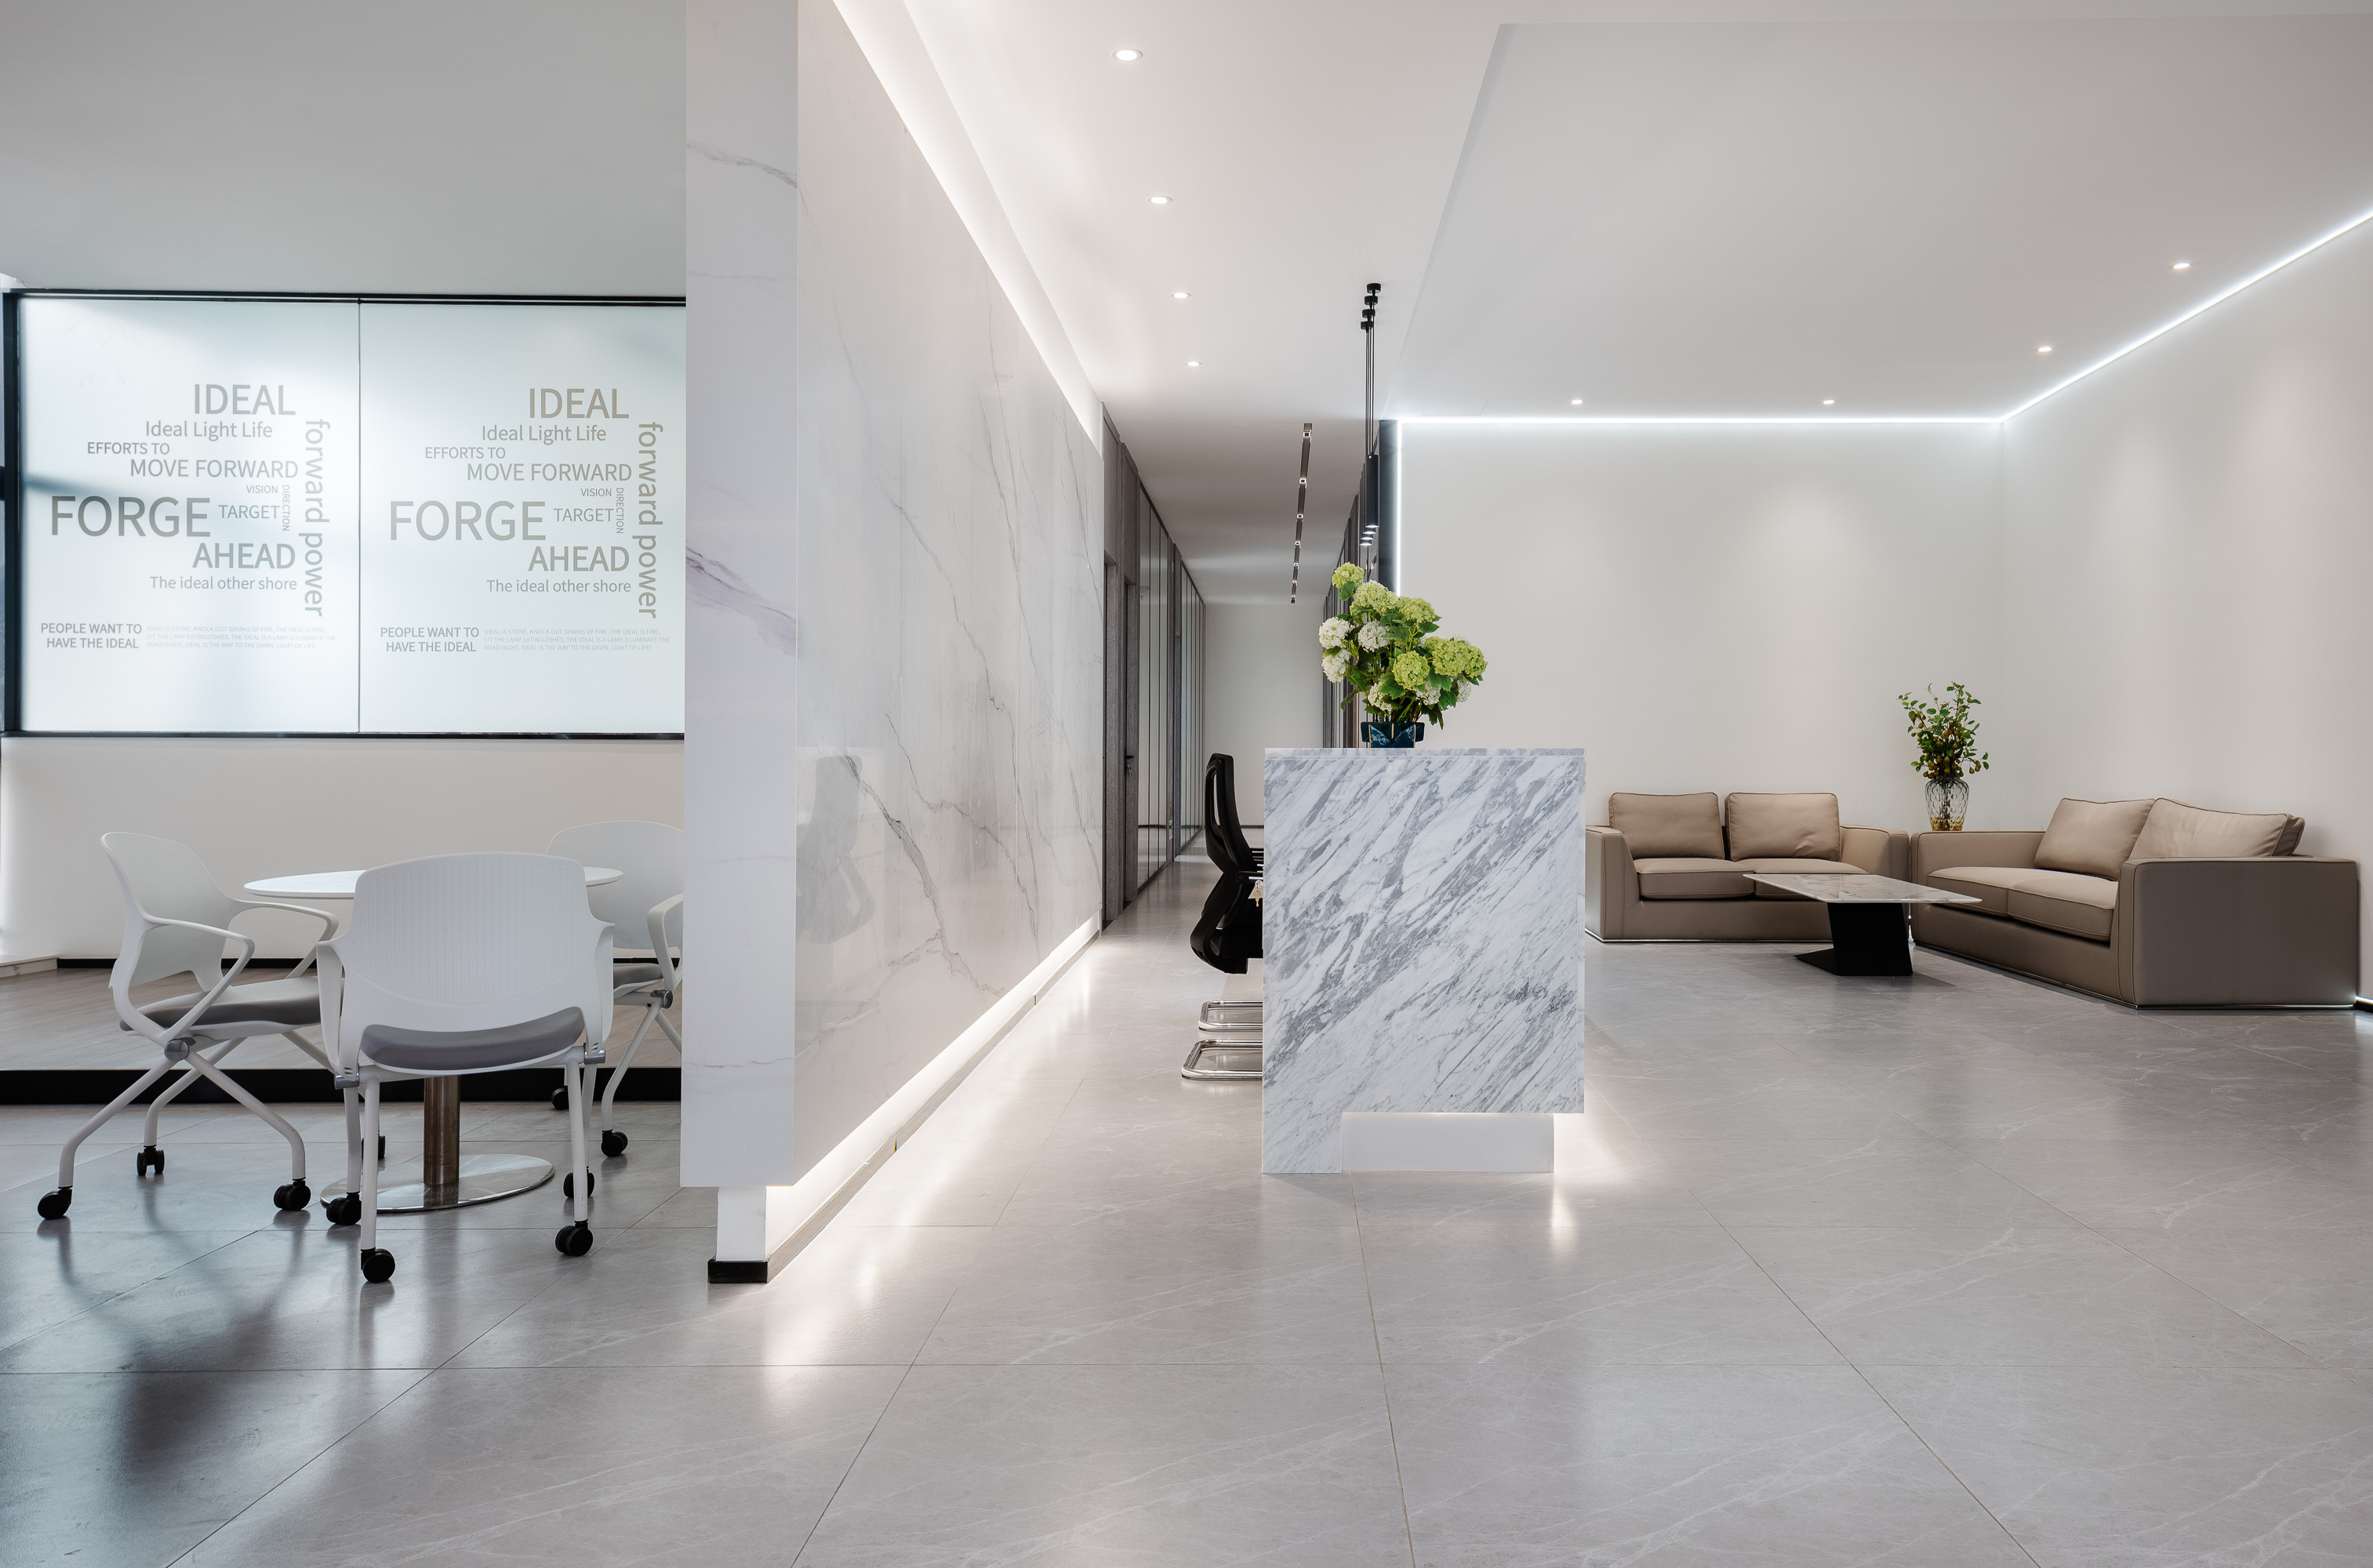 利達光電辦公室設計